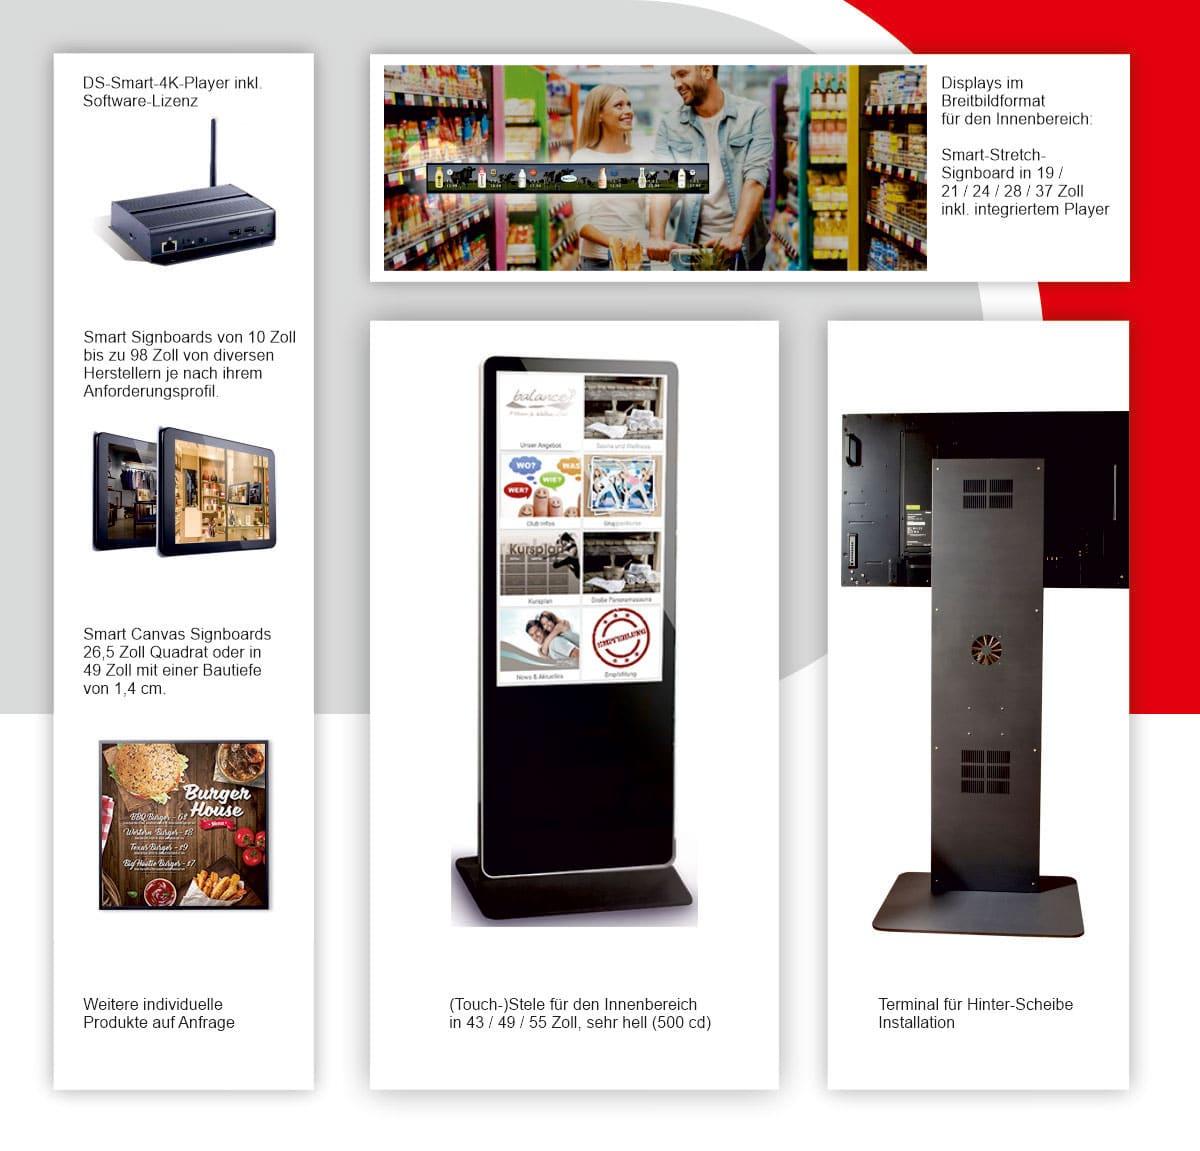 shipleys - Kempf Werbetechnik - Indoor Digital Signage Lösungen